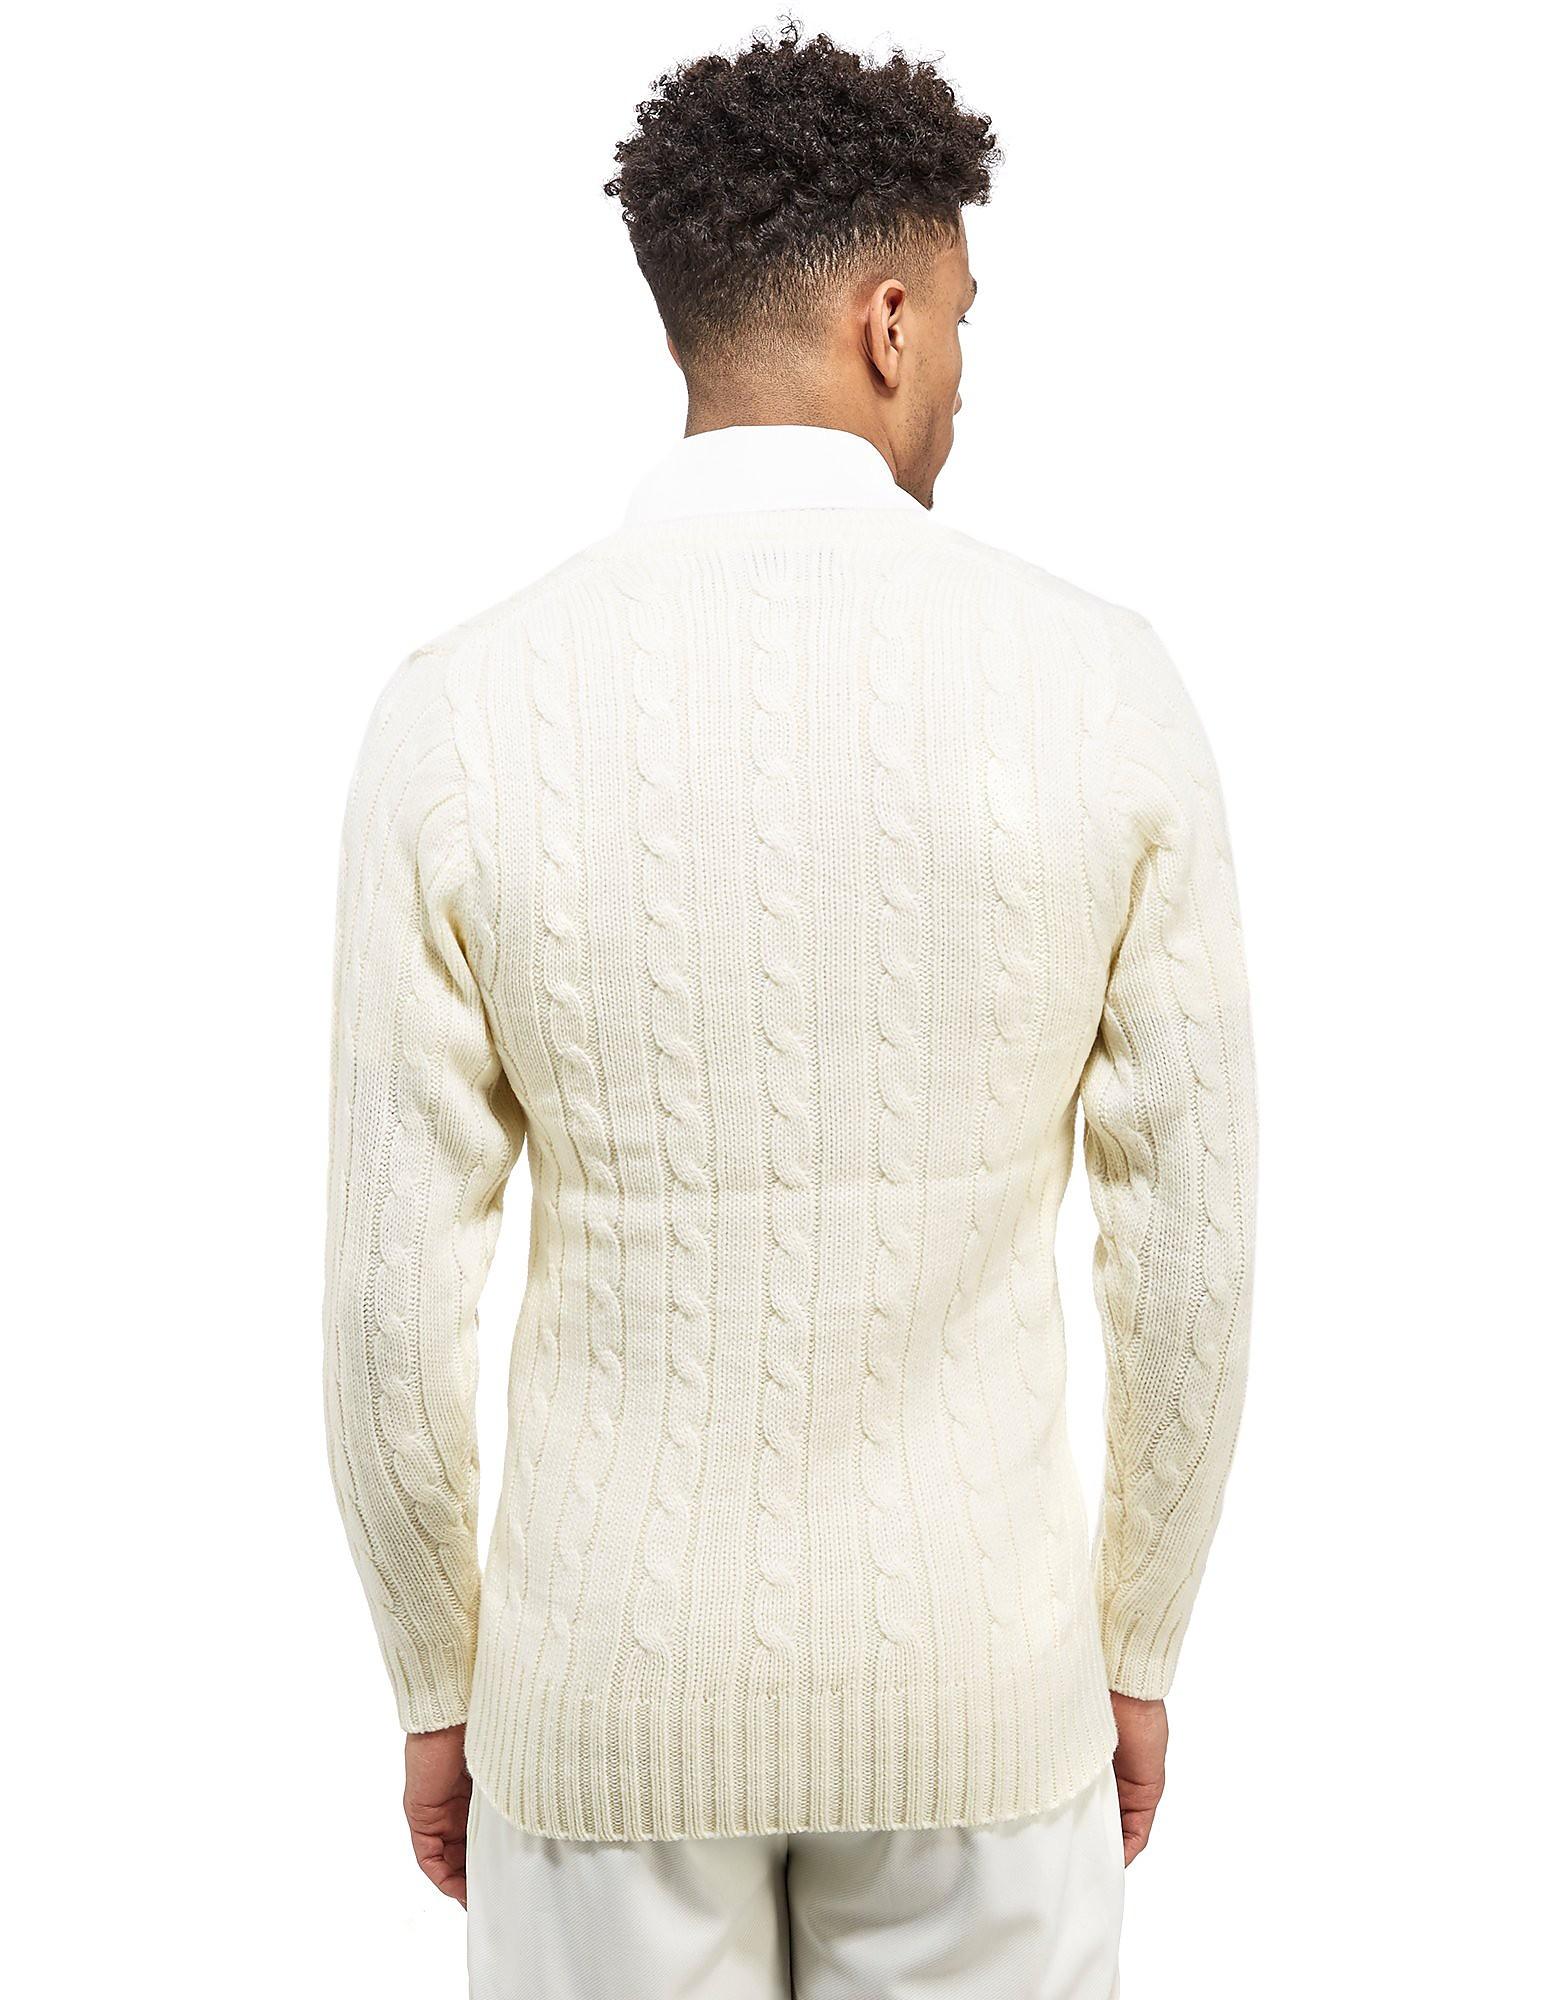 Gray Nicolls Acrylic Cricket Sweater